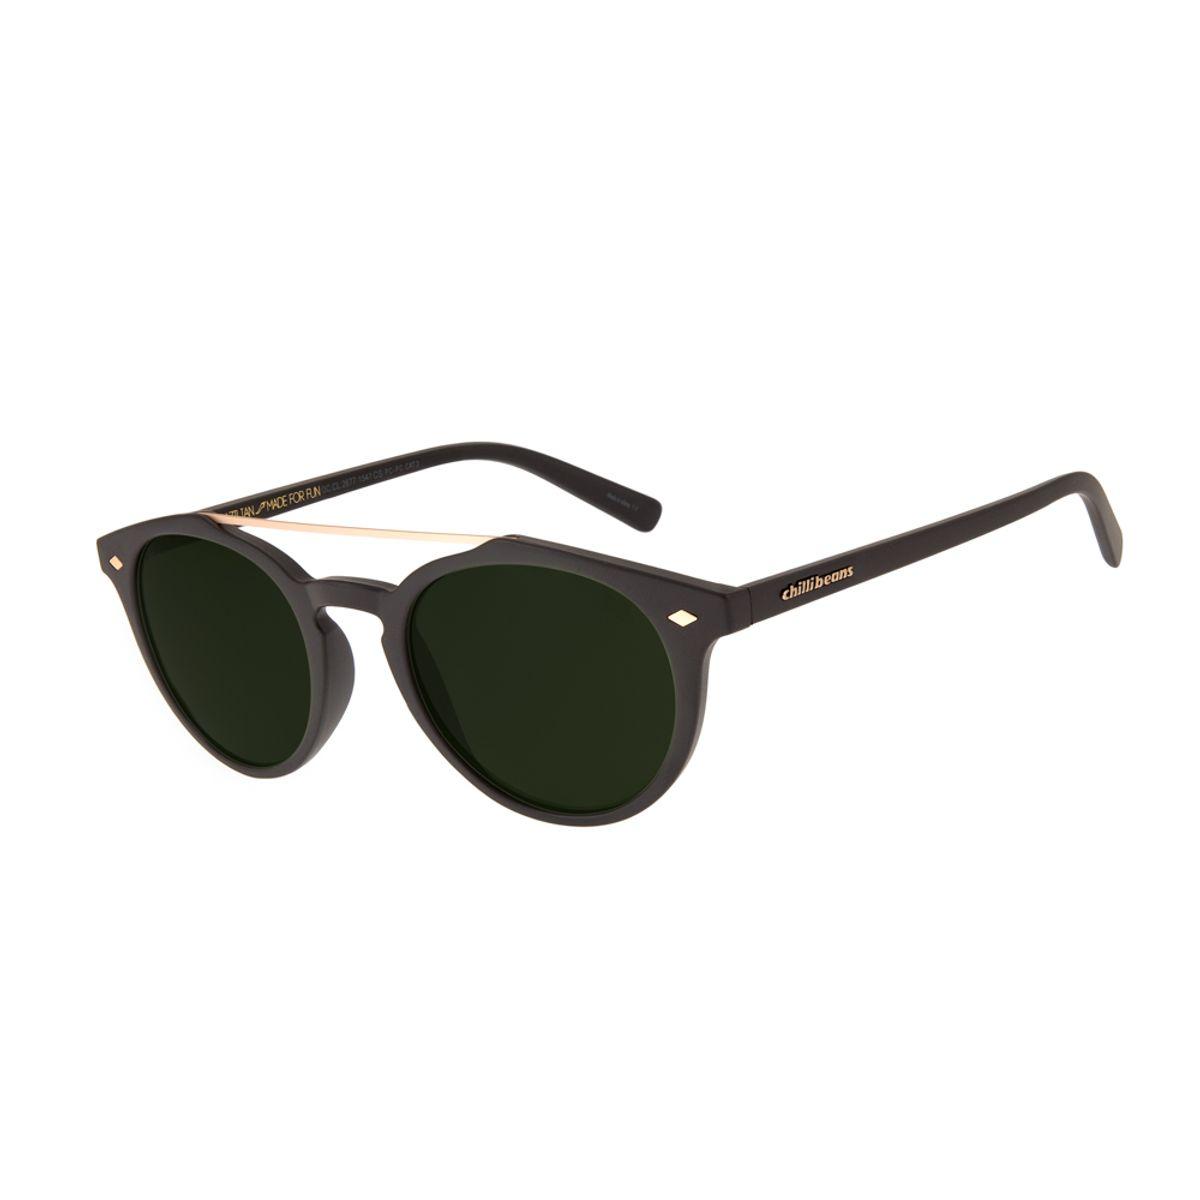 2bf047e621dd5 Óculos de Sol Unissex Chilli Beans Vintage por Marcelo Sommer Marrom ...